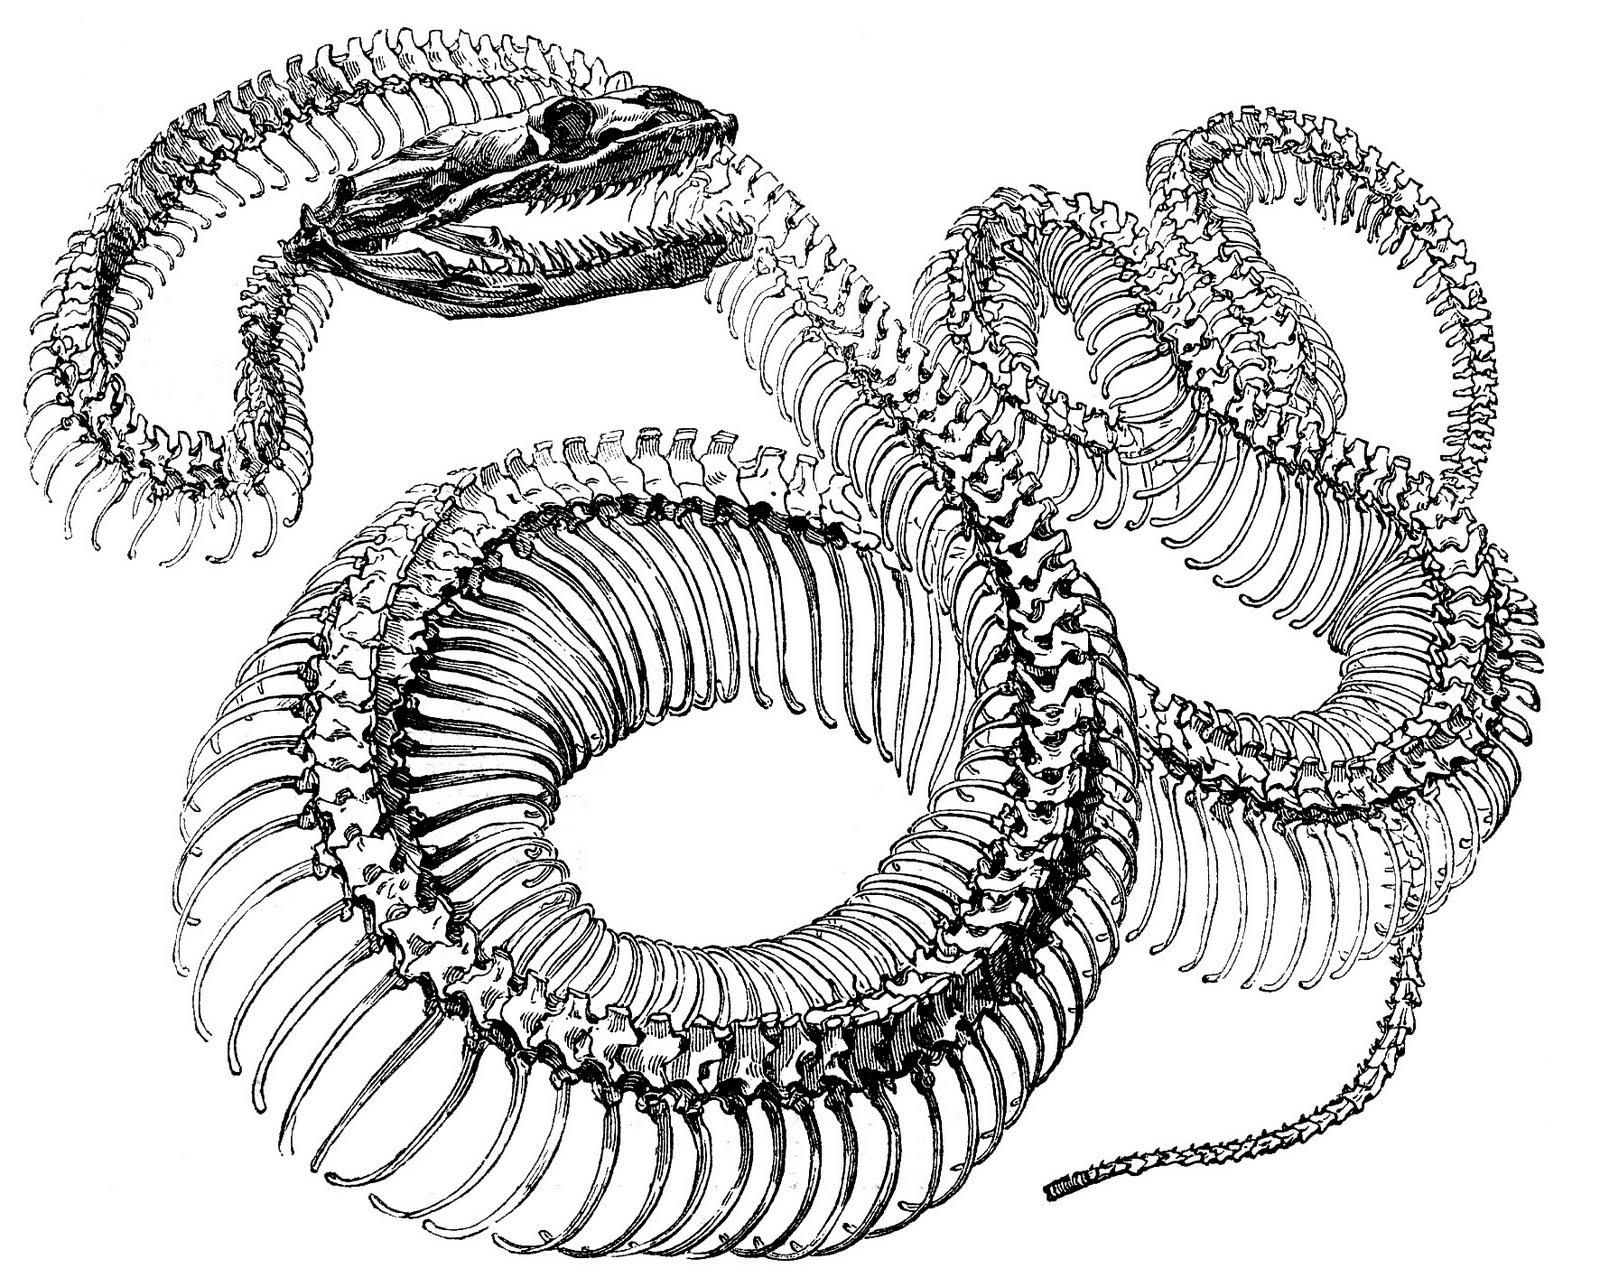 Two Headed Snake 8 Snake Images